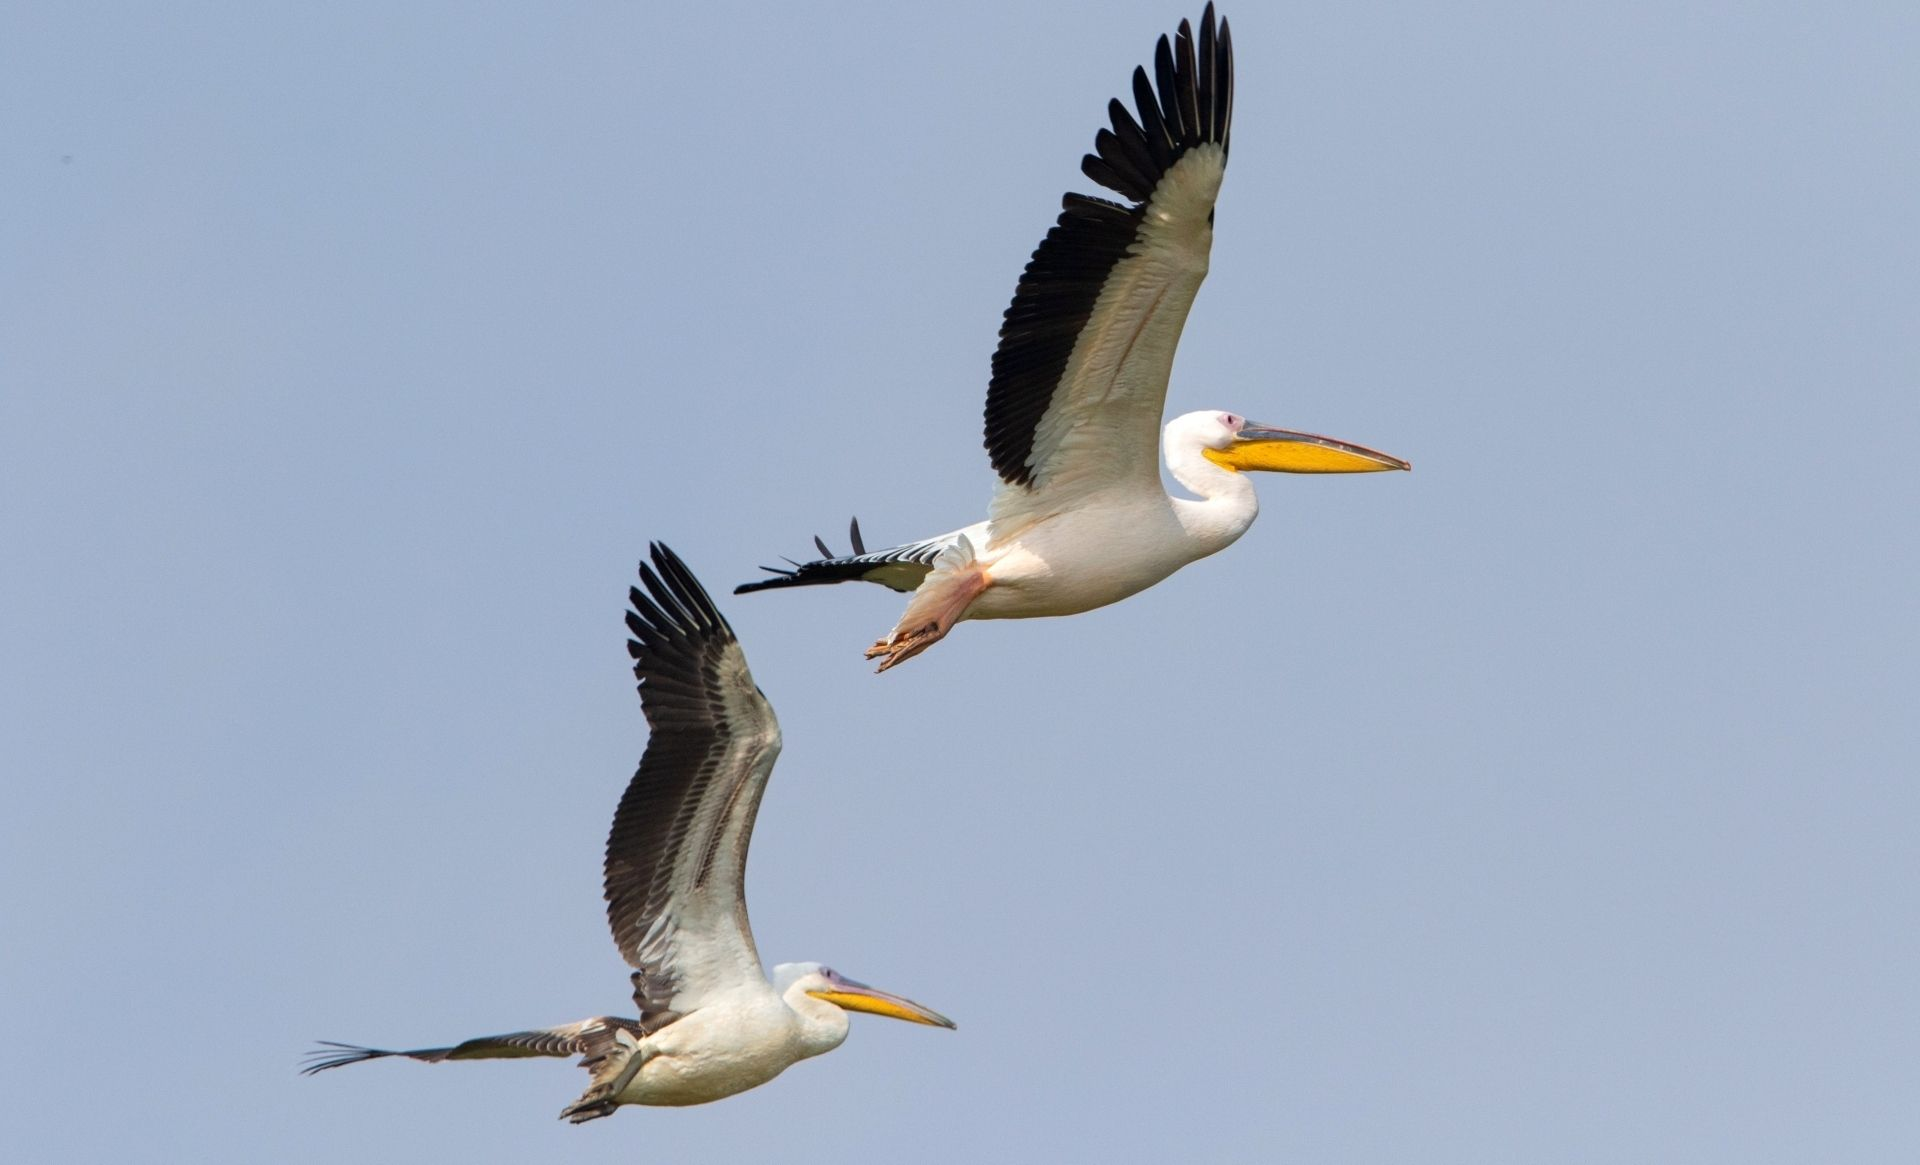 RAAS Chhatrasagar – a wonderful place to see wildlife